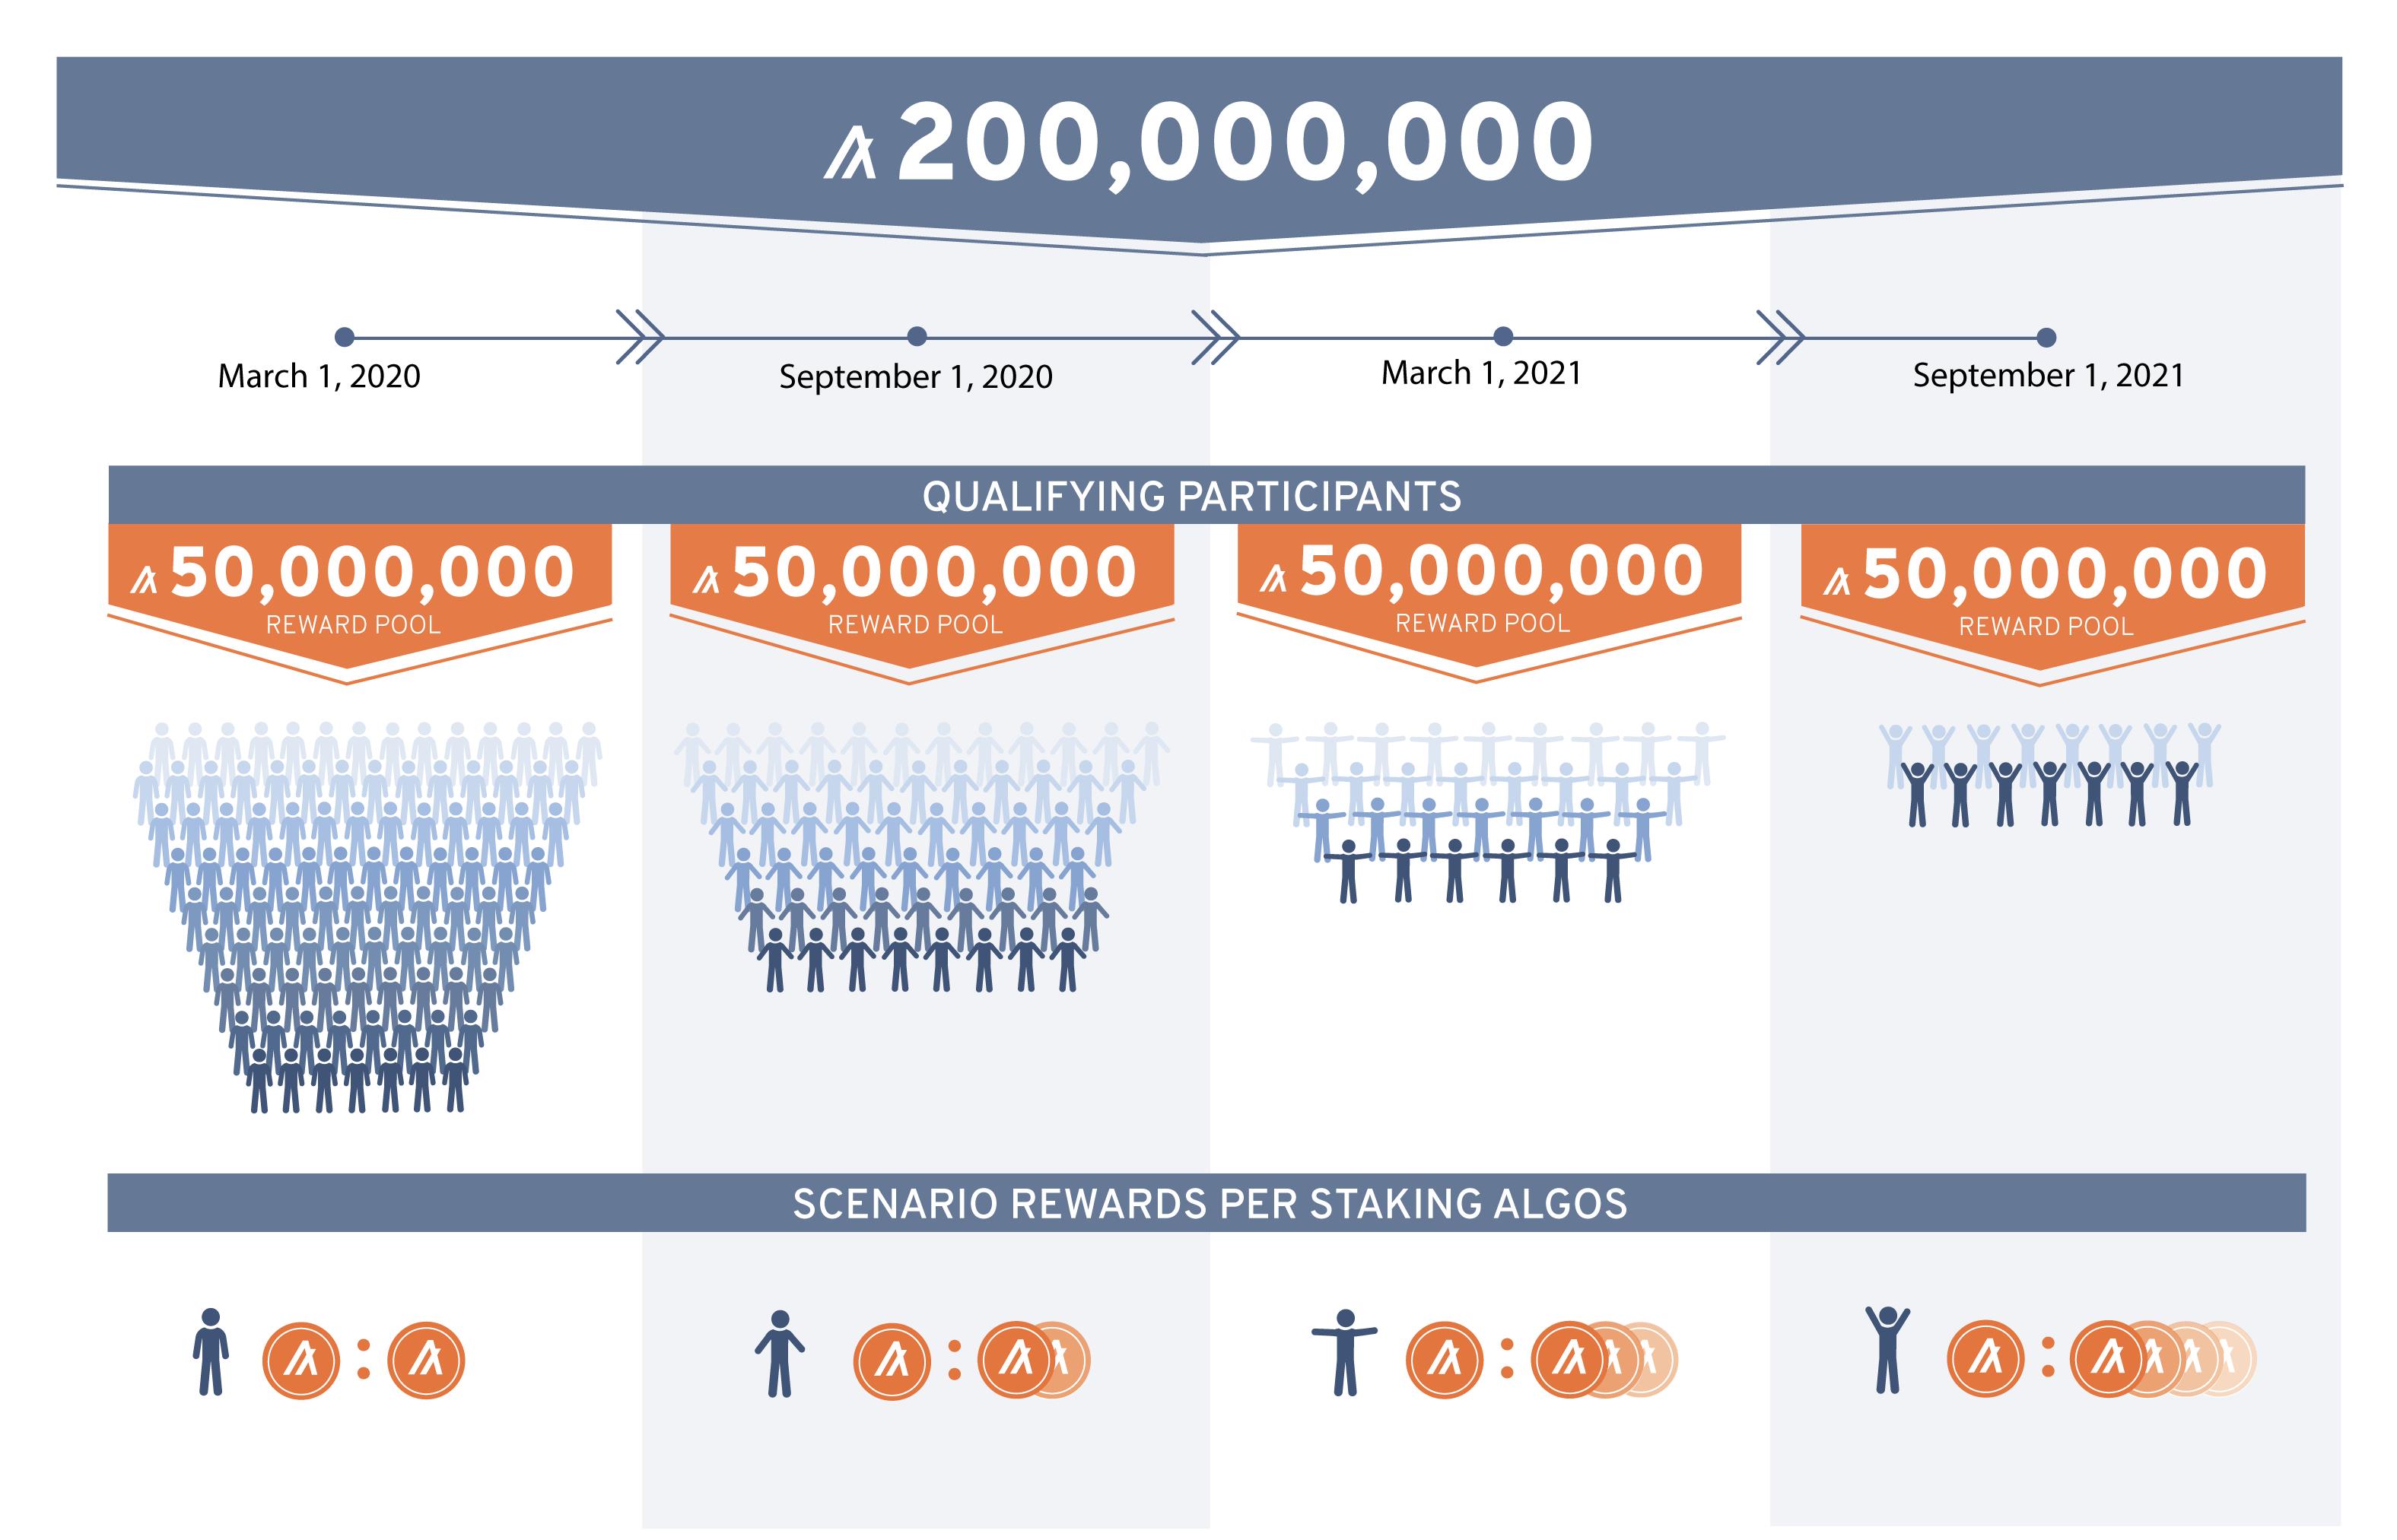 200 Million Algo Staking Rewards Program | Algorand Foundation